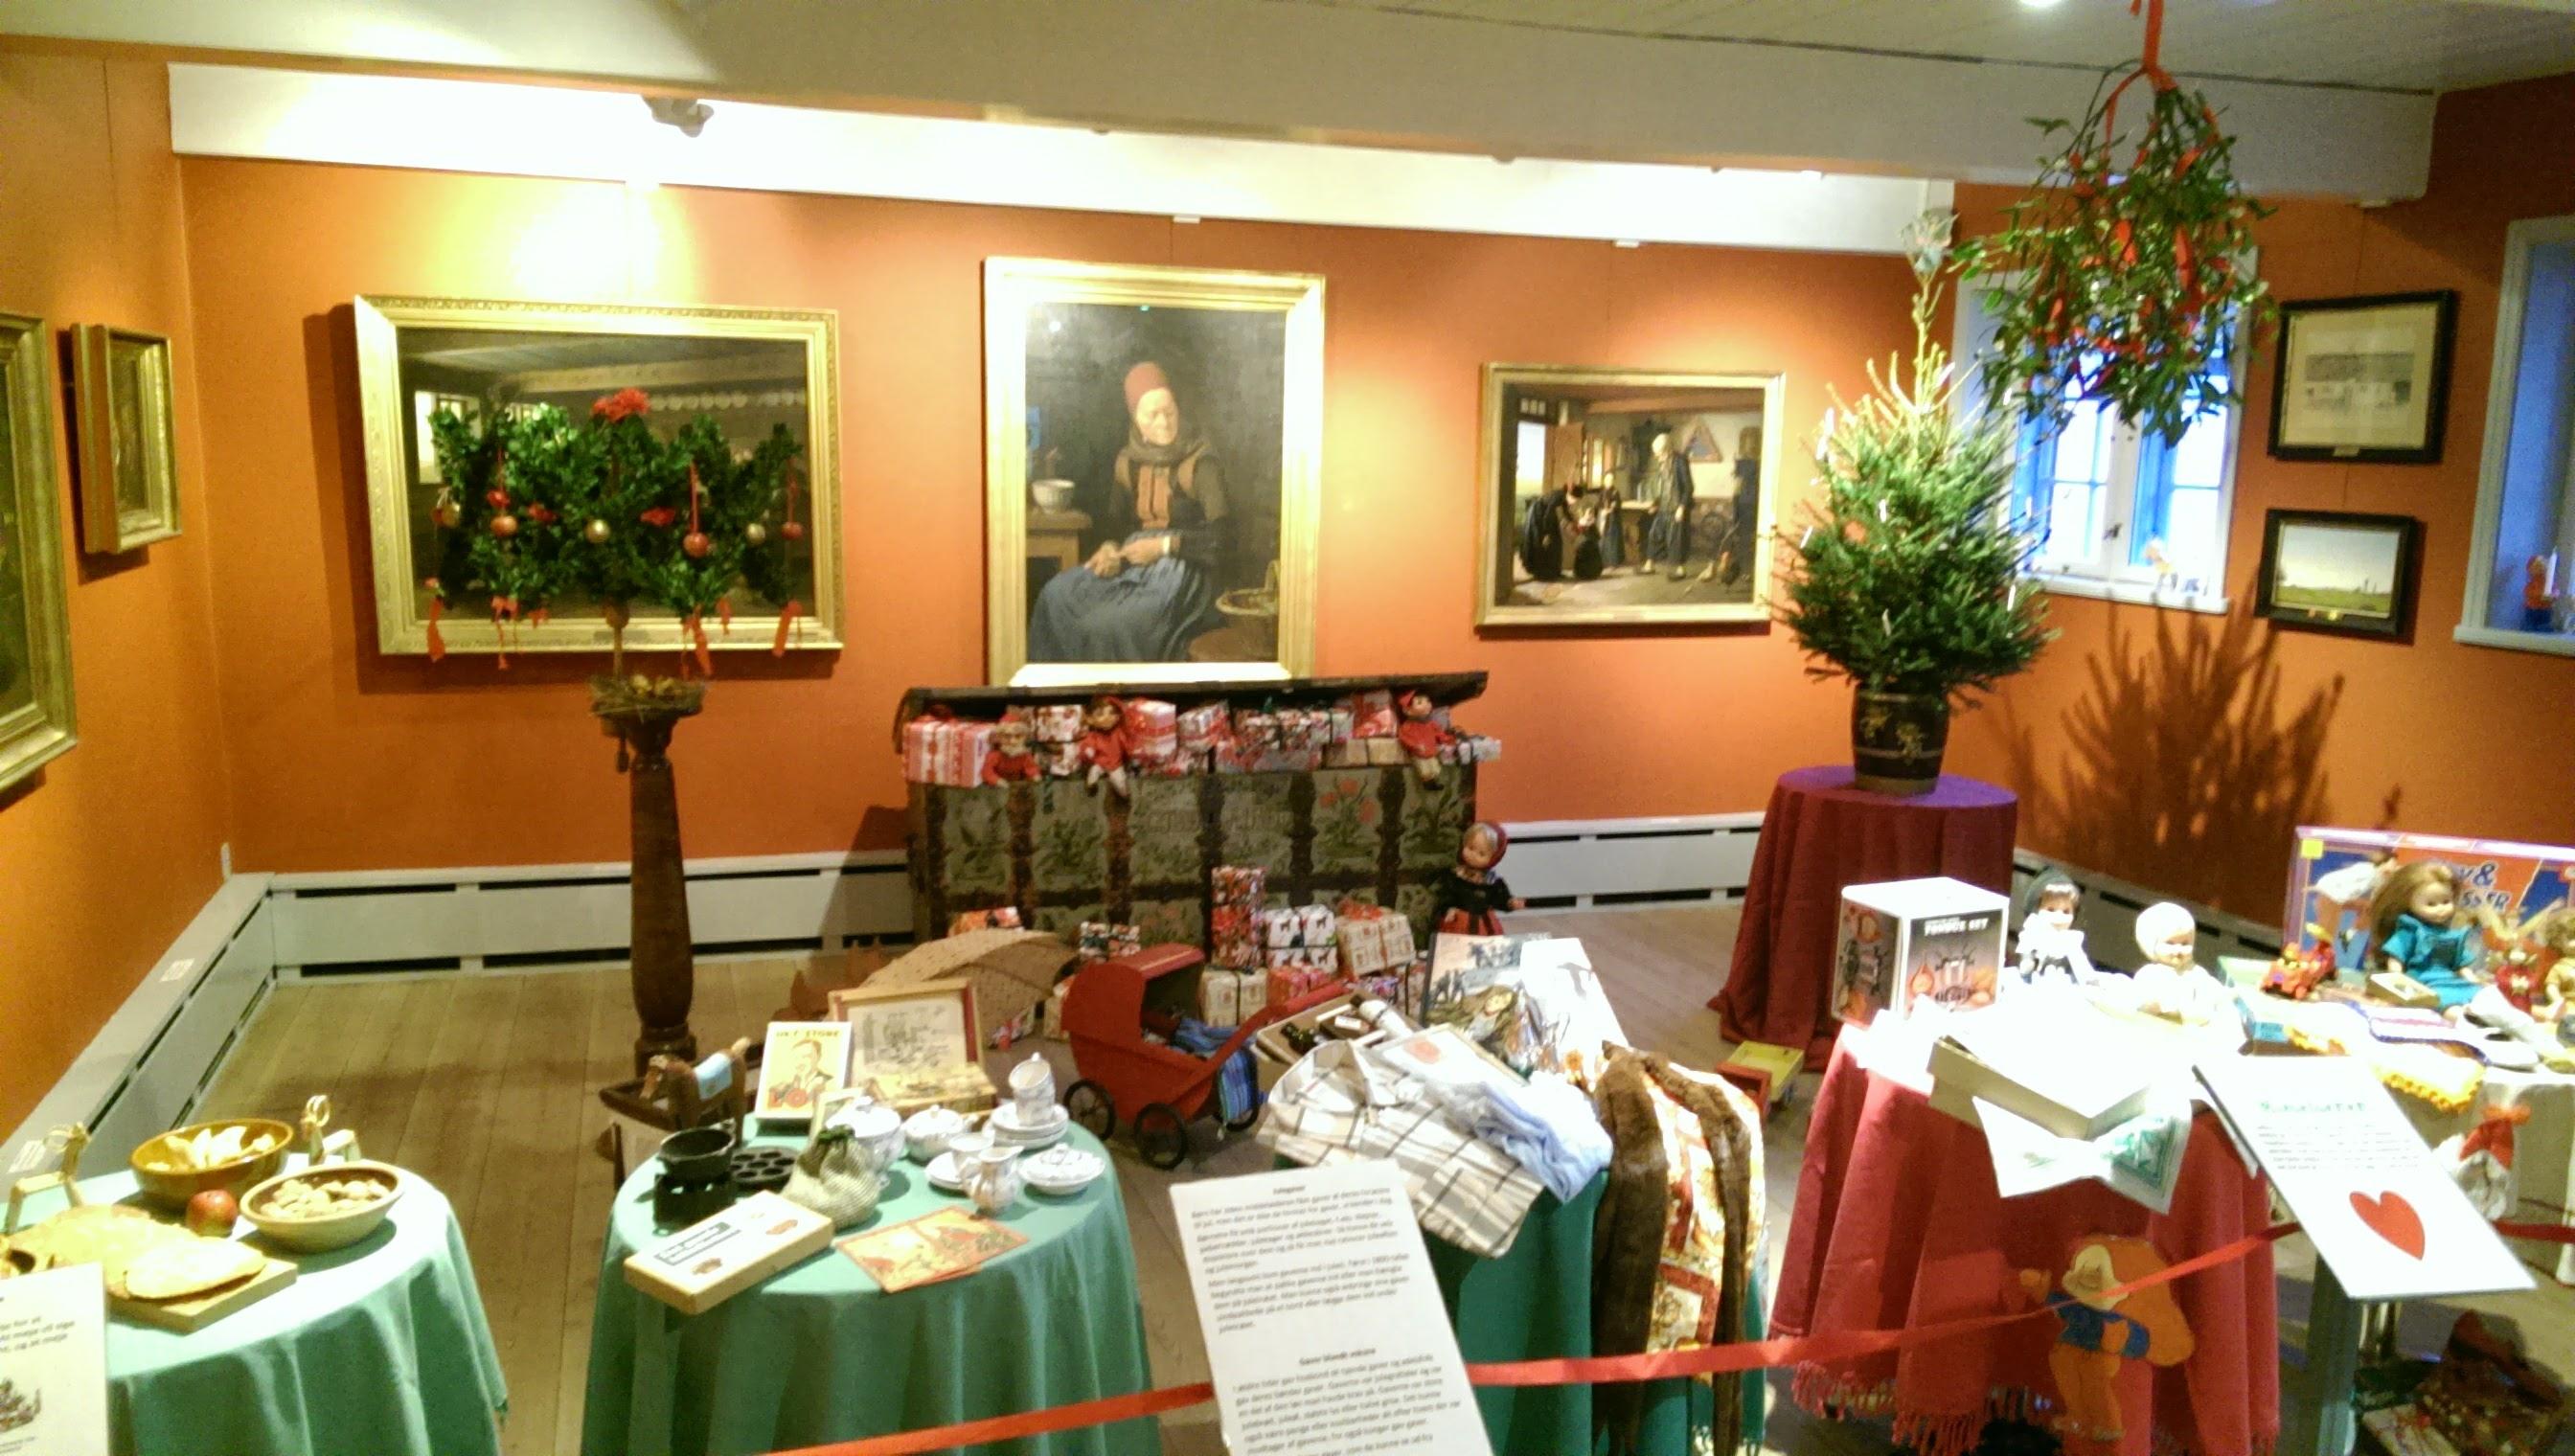 Juleudstilling på Amagermuseet